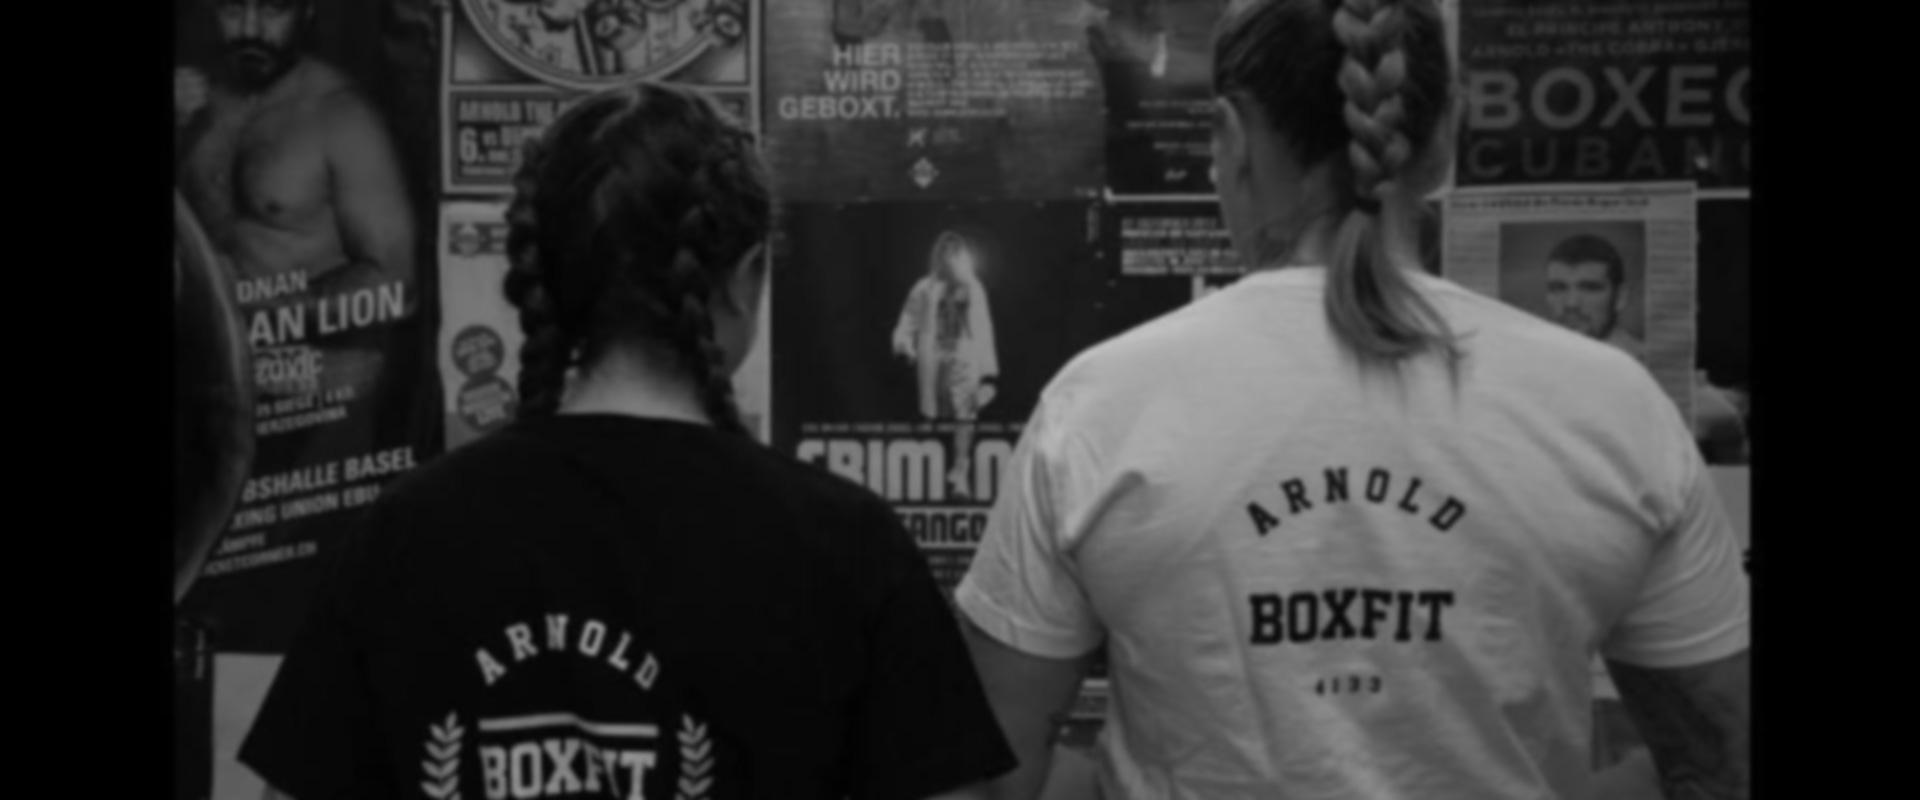 Fintess Coaches und Trainer bei Arnold Boxfit